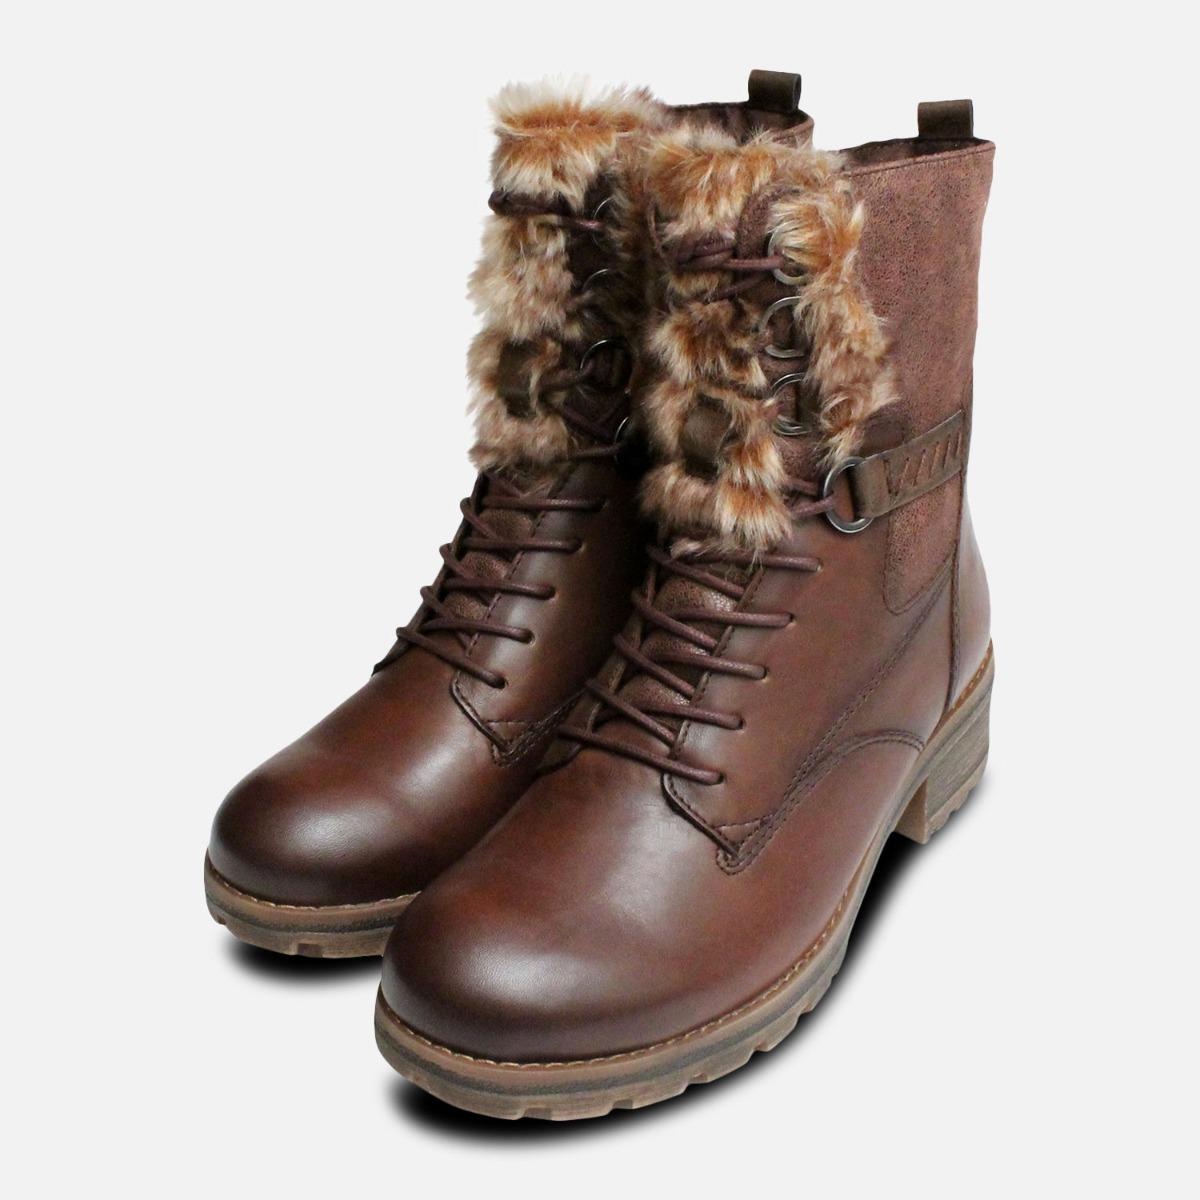 tamaris leopard boots